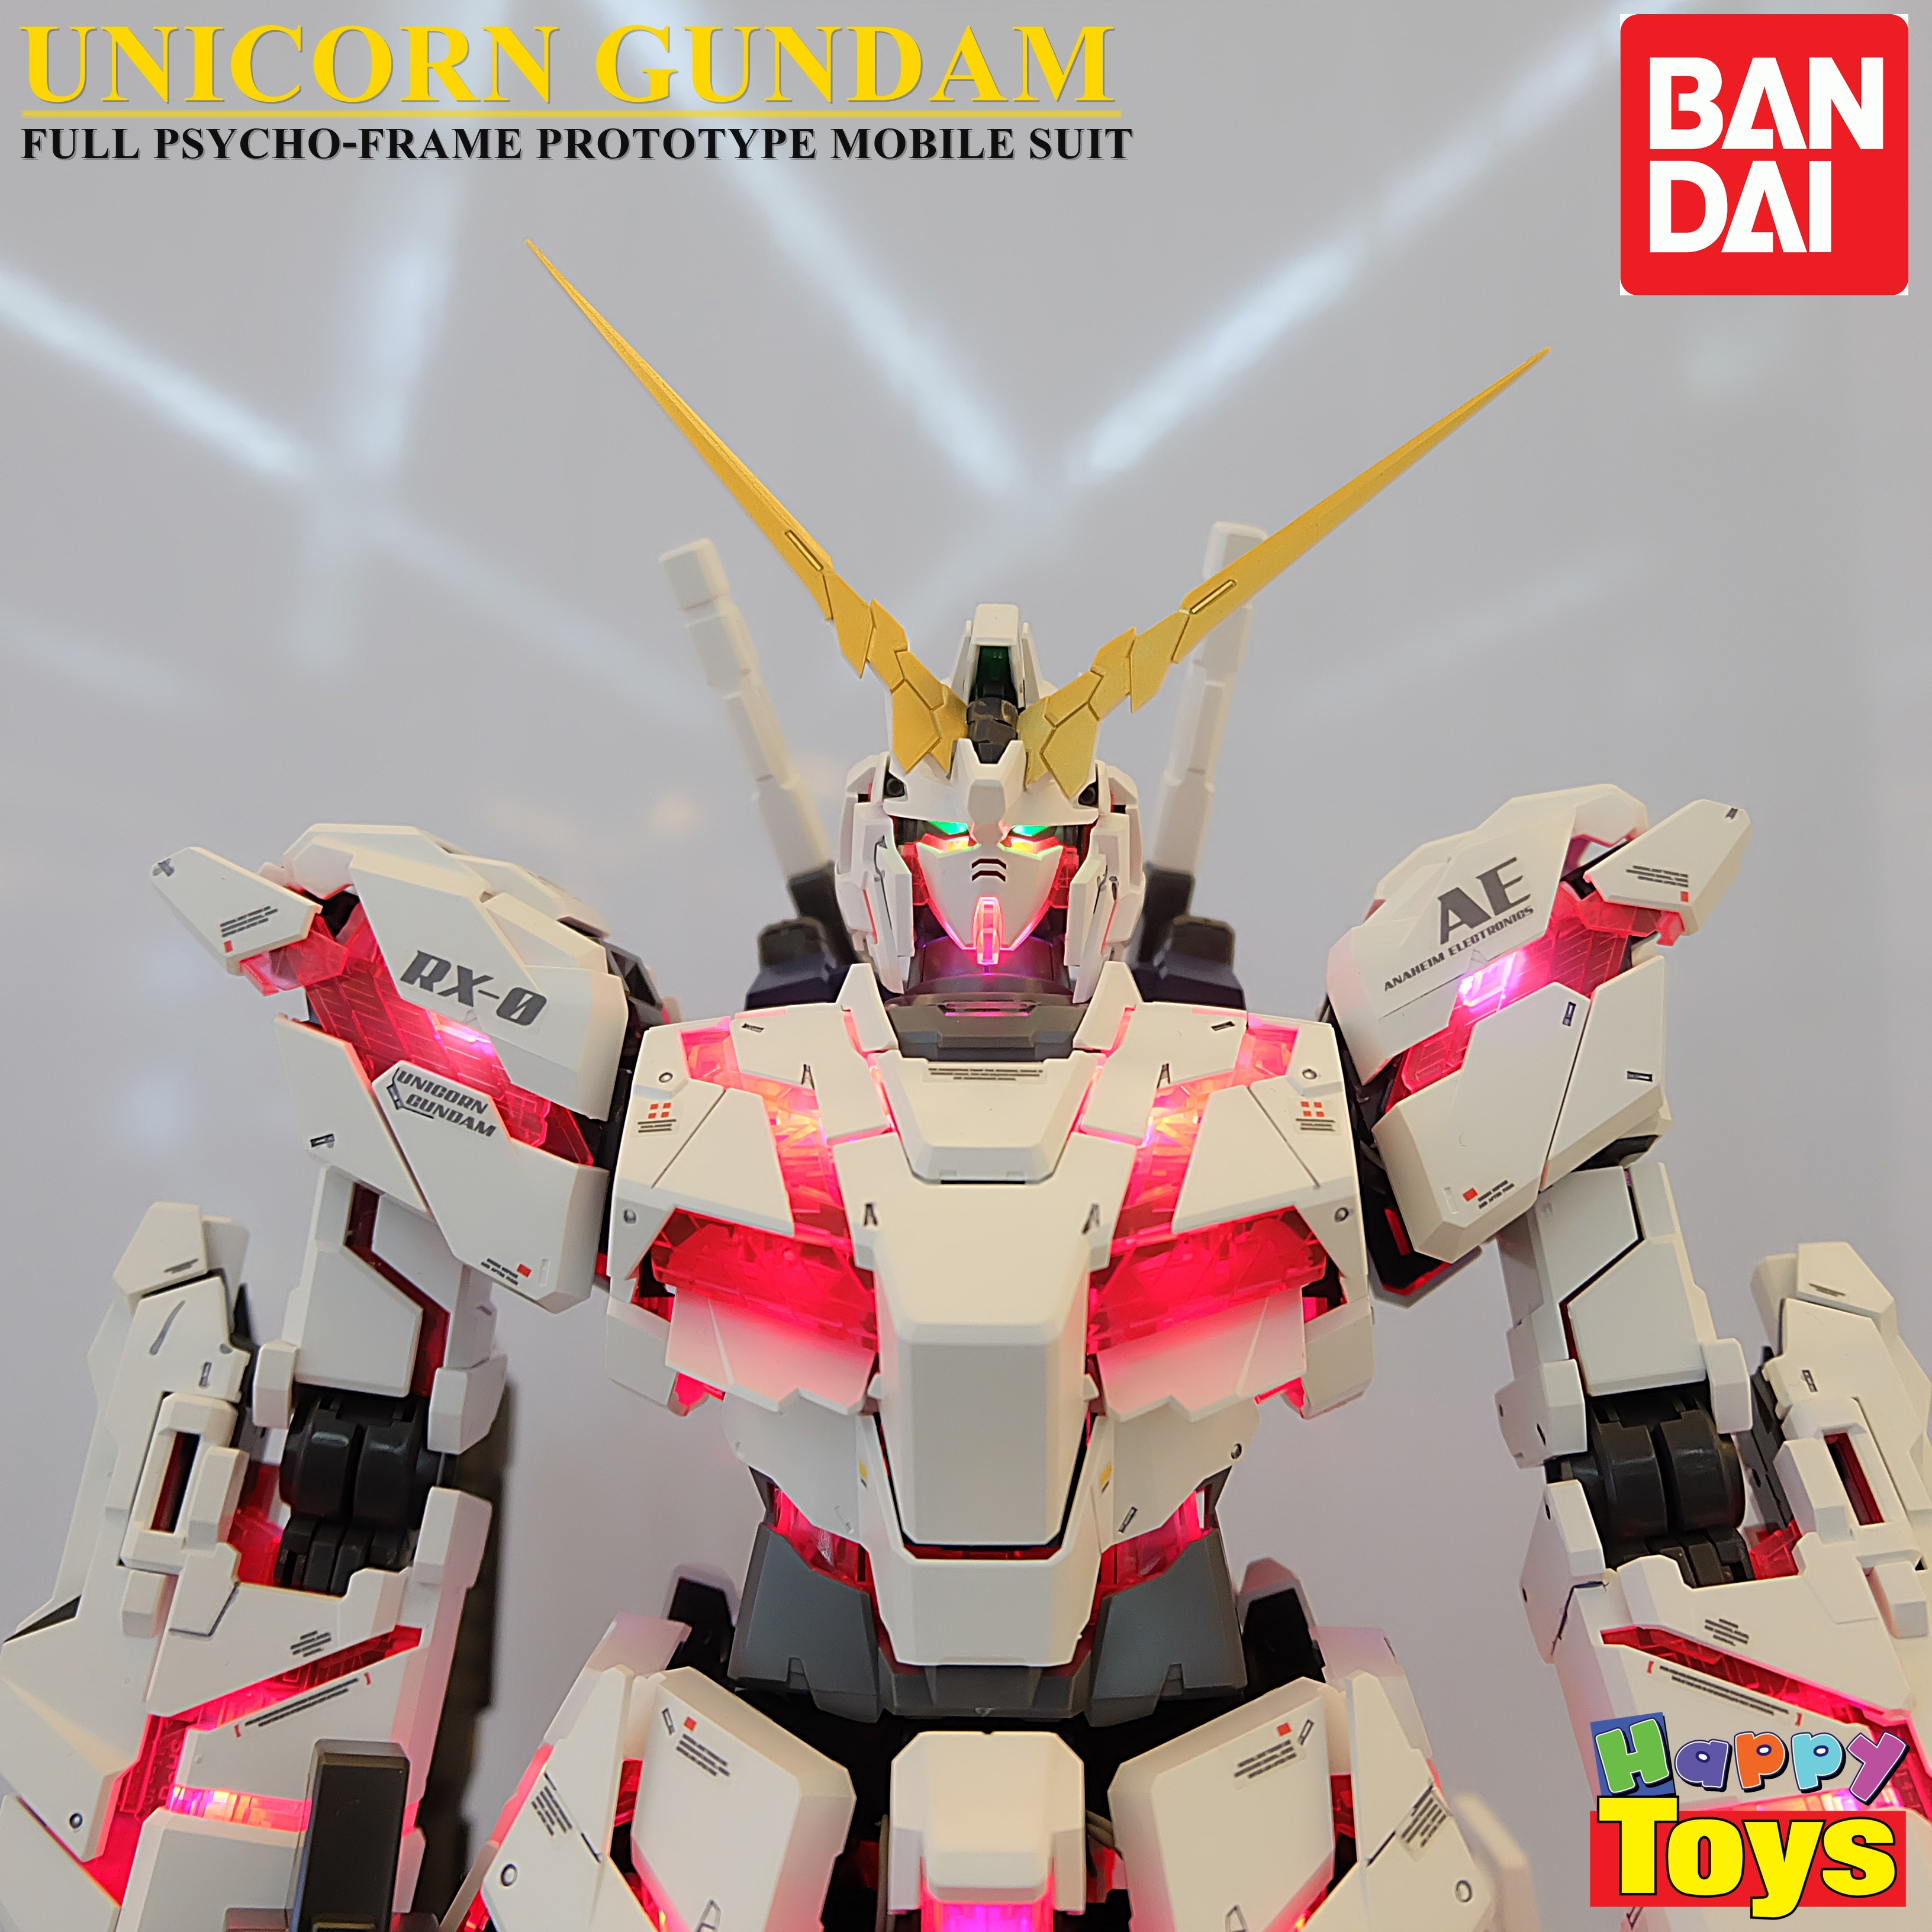 Unicorn gundam กันพลา โมเดล กันดั้ม PG ขนาด 1/60 RX-0 Gundam Unicorn ลิขสิทธ์แท้ Bandai Japan PG 1/60 RX-0 Gundam Unicorn